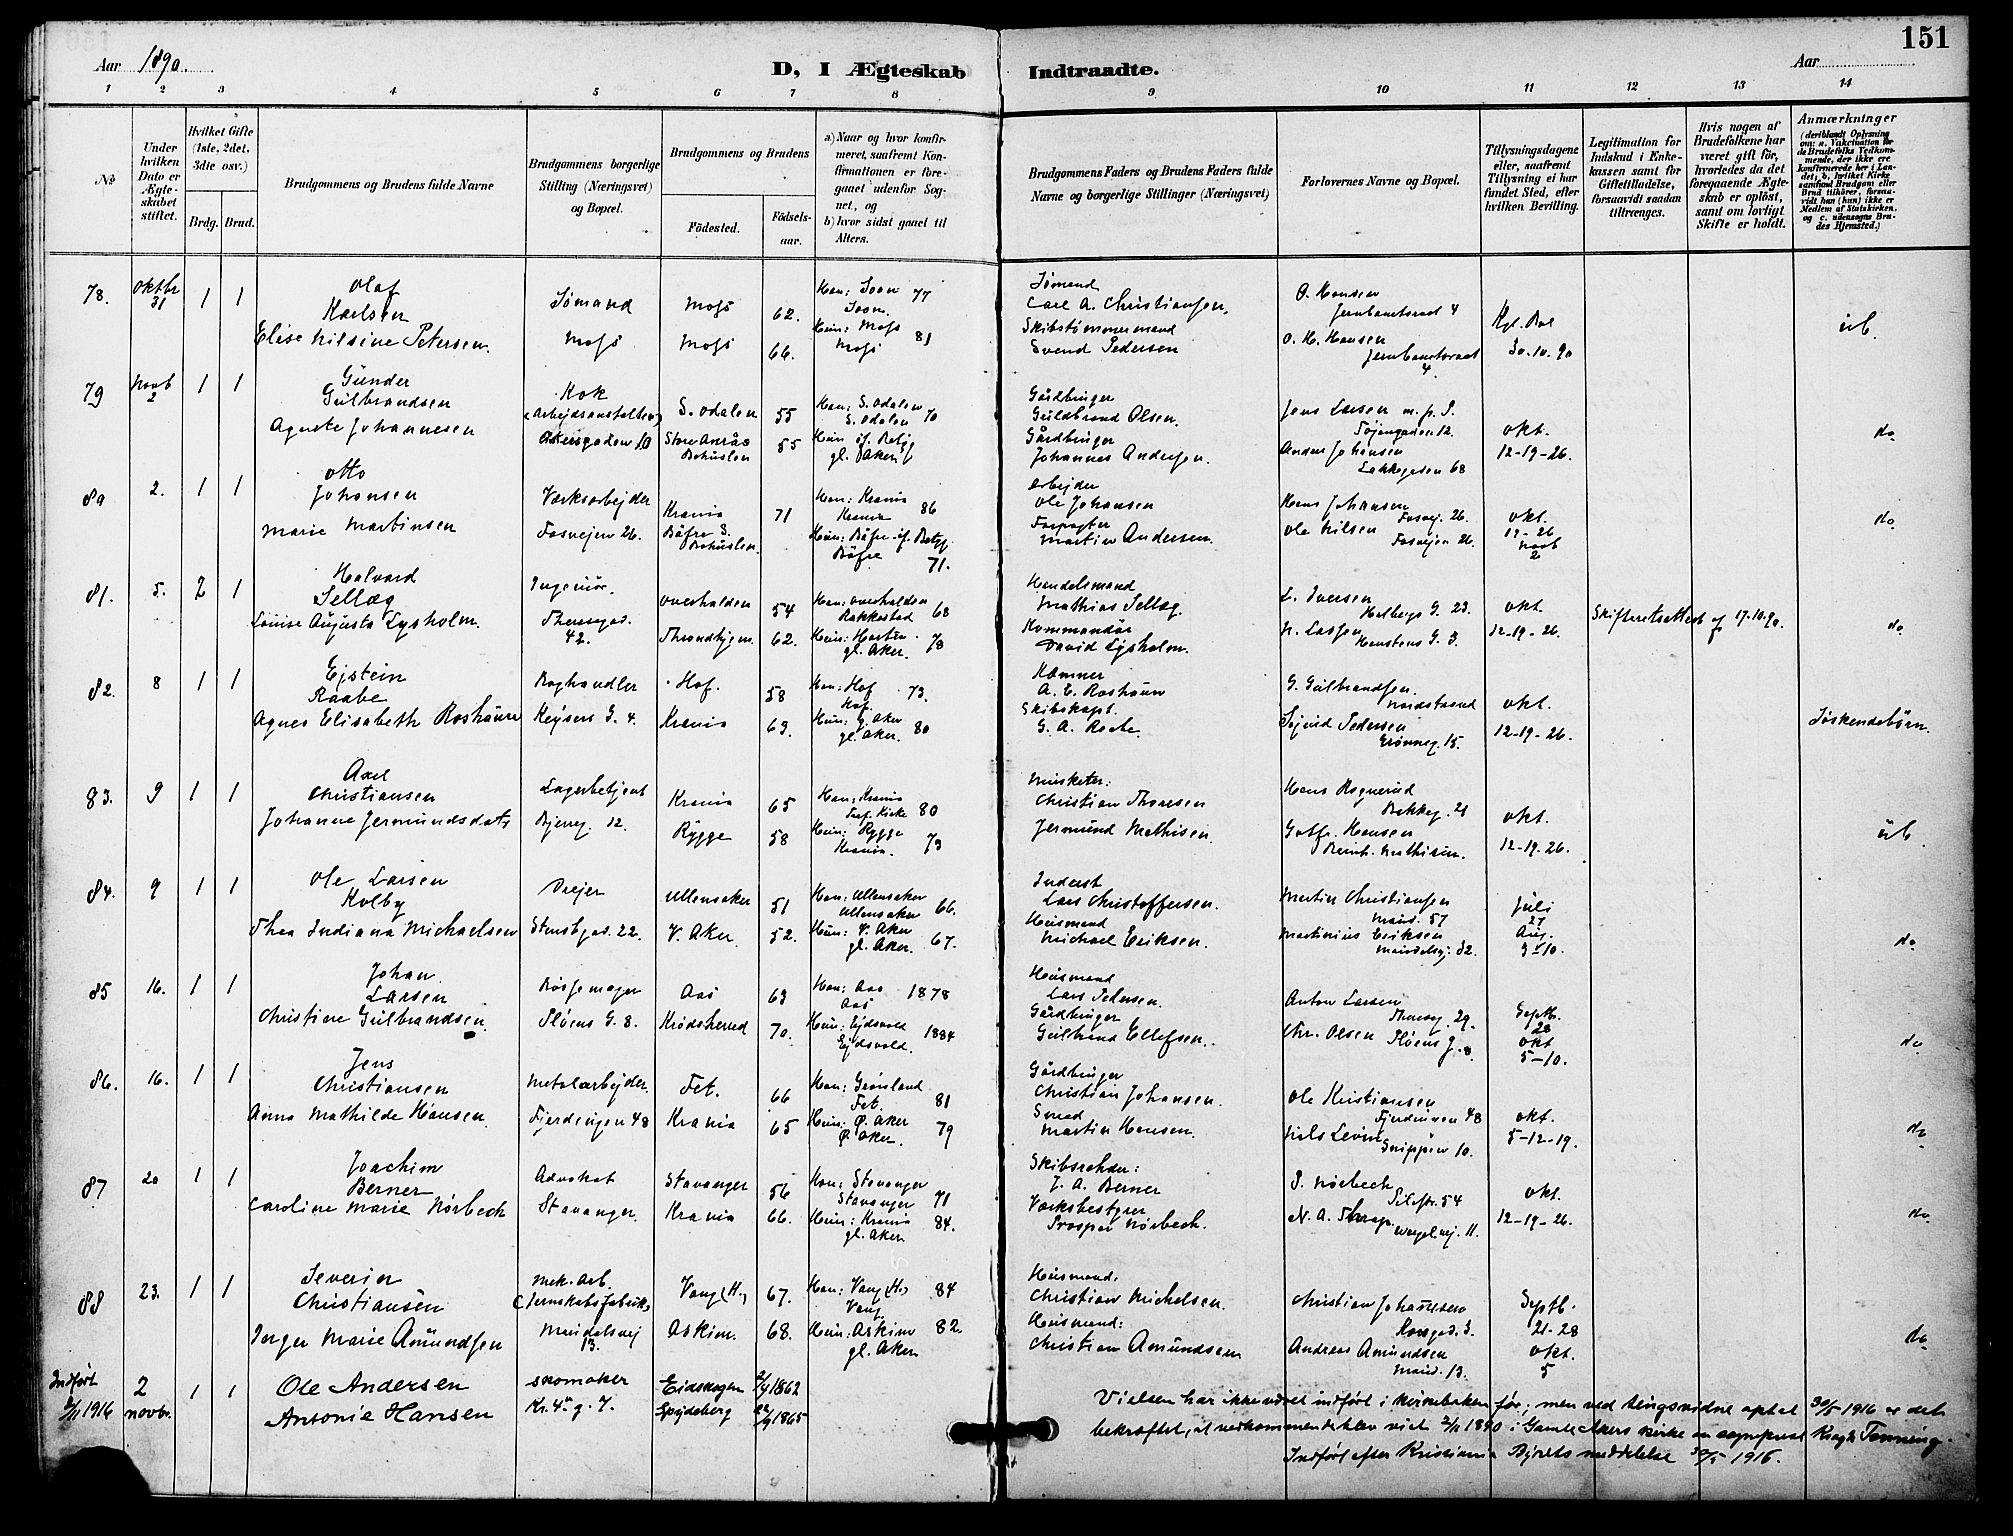 SAO, Gamle Aker prestekontor Kirkebøker, F/L0009: Parish register (official) no. 9, 1890-1898, p. 151